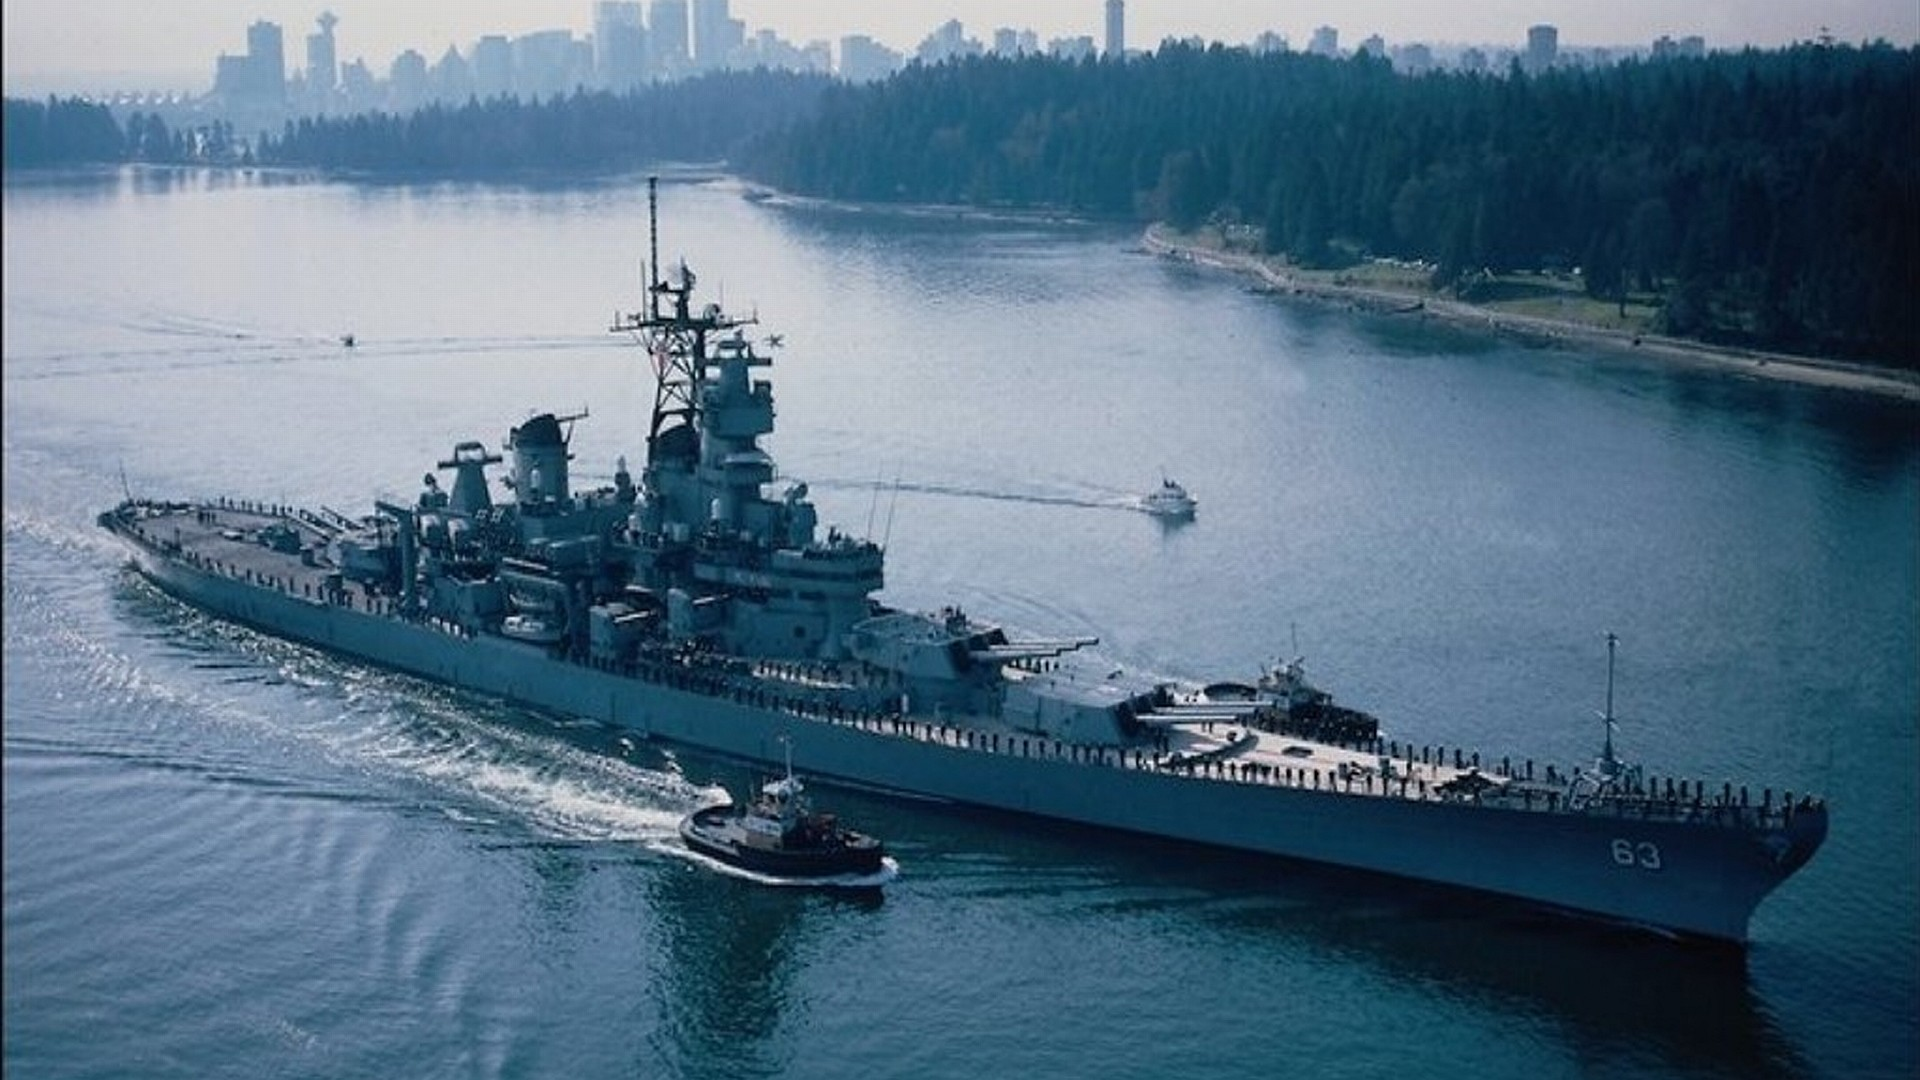 navy wallpaper 1440x900 ships - photo #11